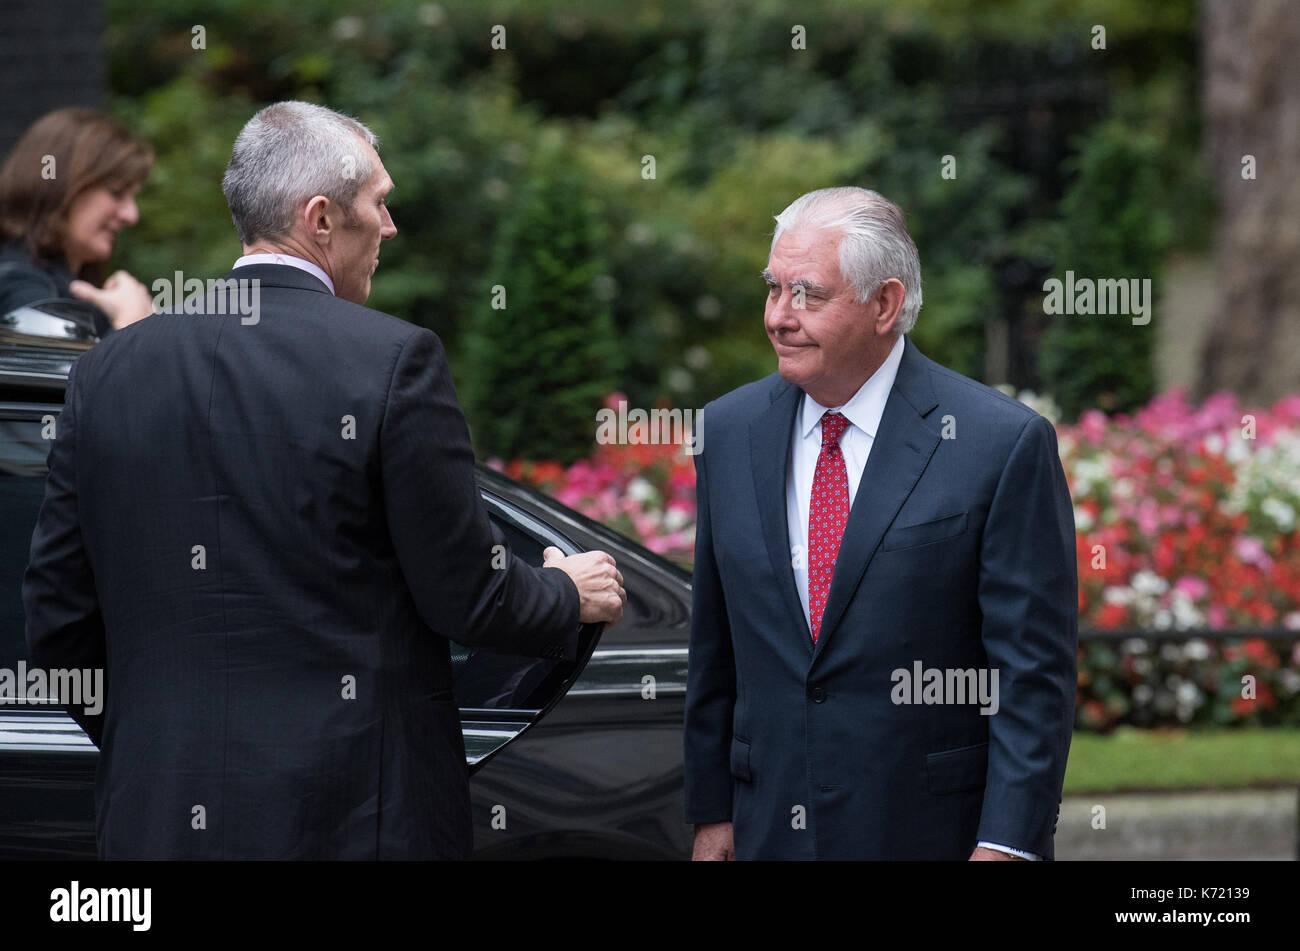 London, United Kingdom. 14 September 2017. US Secretary of State, Rex Tillerson, arrives at 10 Downing Street. Credit: - Stock Image